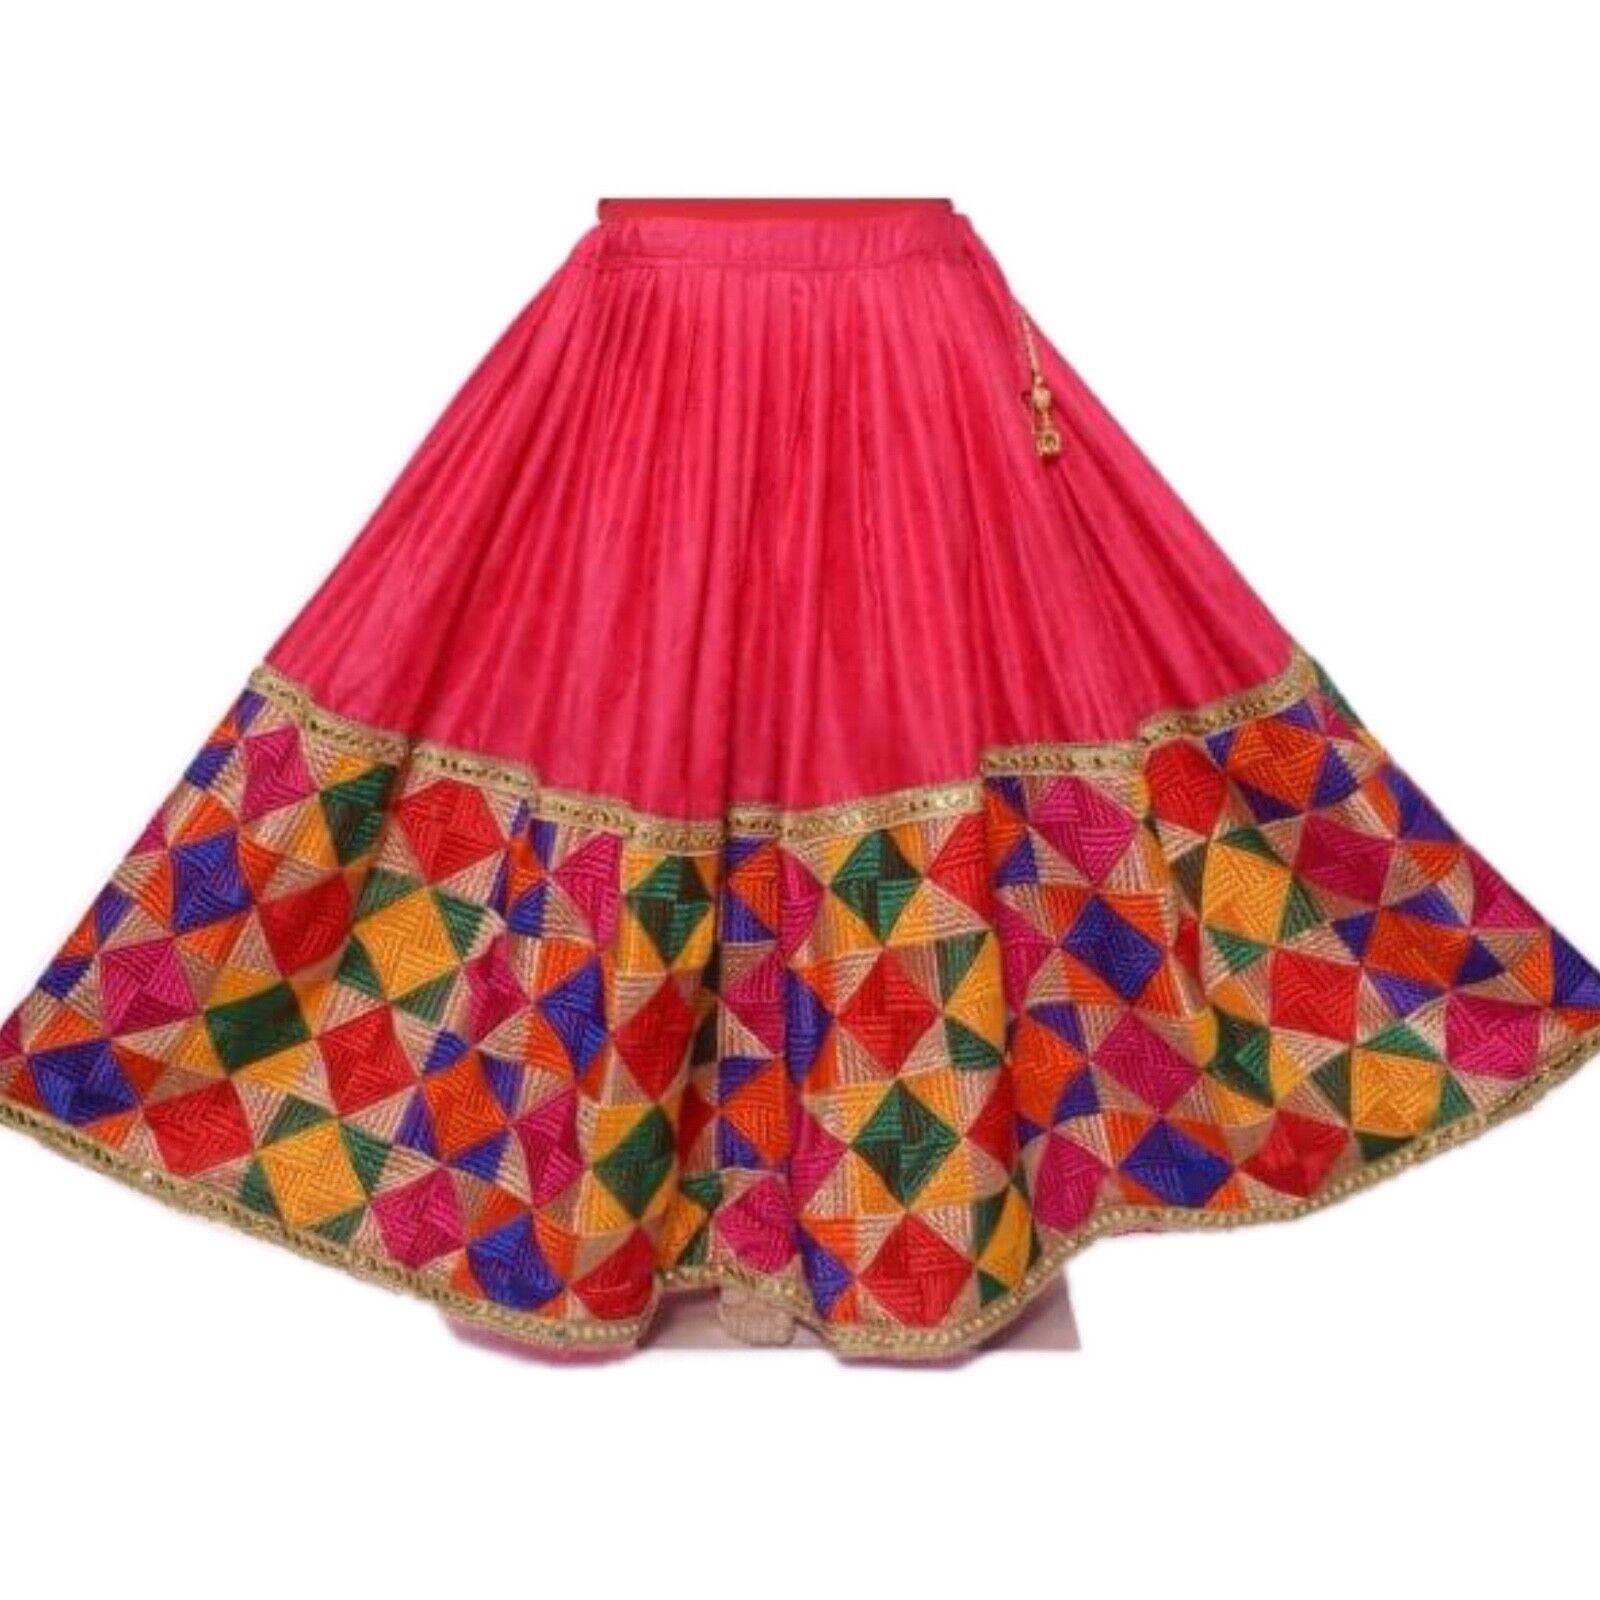 Indian Phulkari Embroidered Lehnga Stylish Ghagra Vintage Skirt